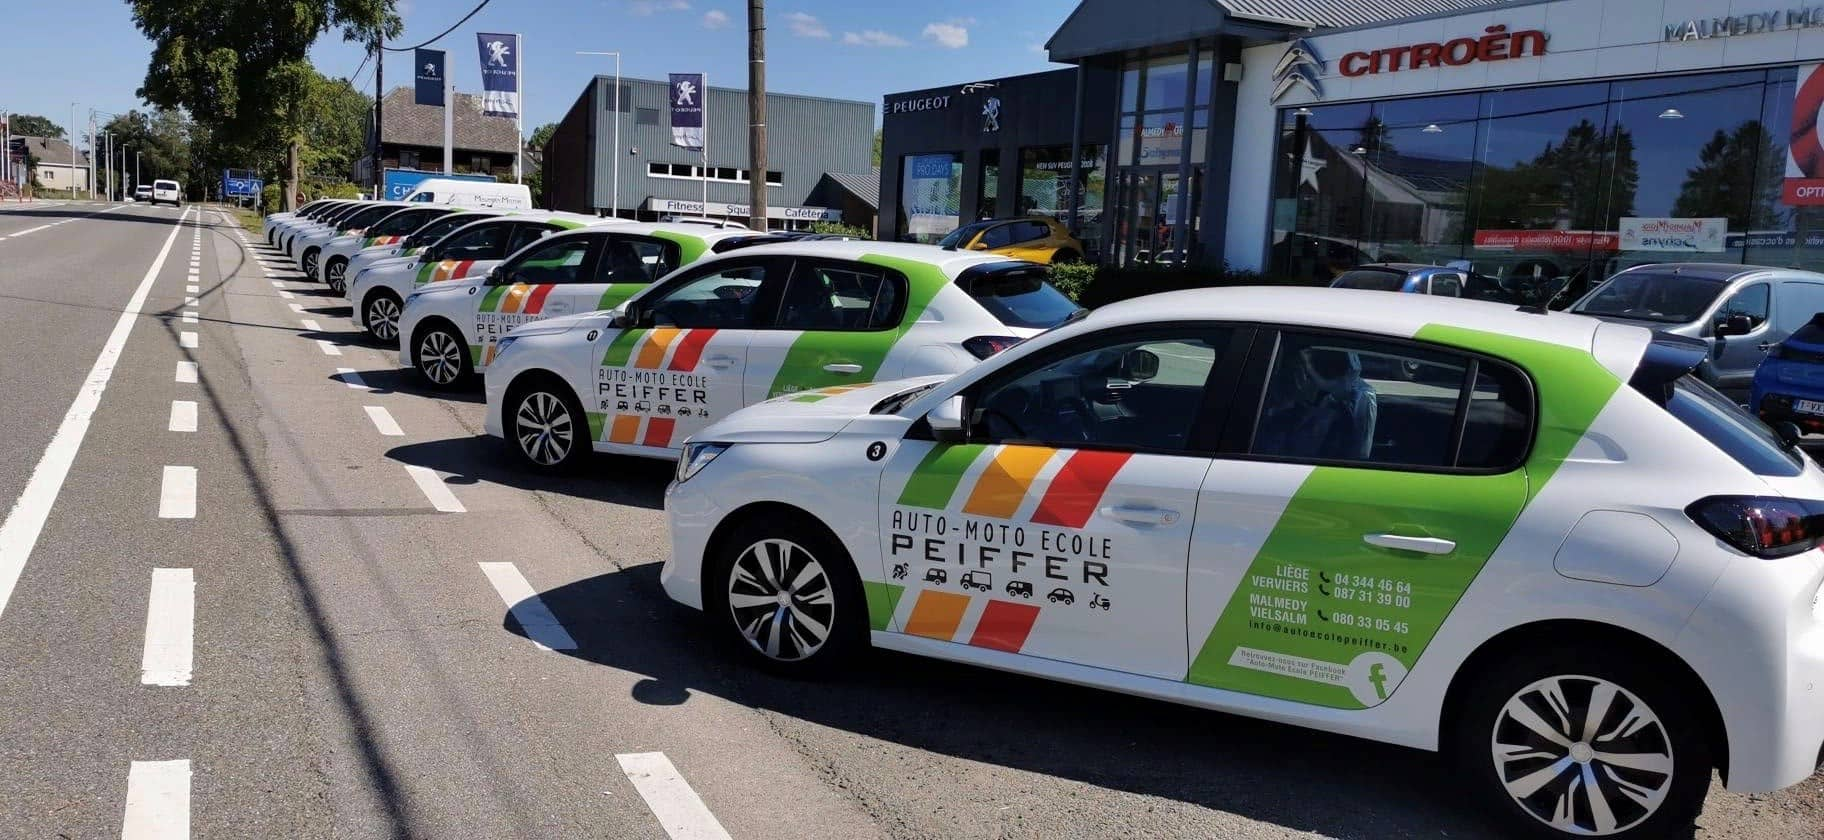 http://Permis%20de%20conduire%20B-Auto%20Ecole%20Peiffer-Liège-Verviers-Malmedy-Vielsalm